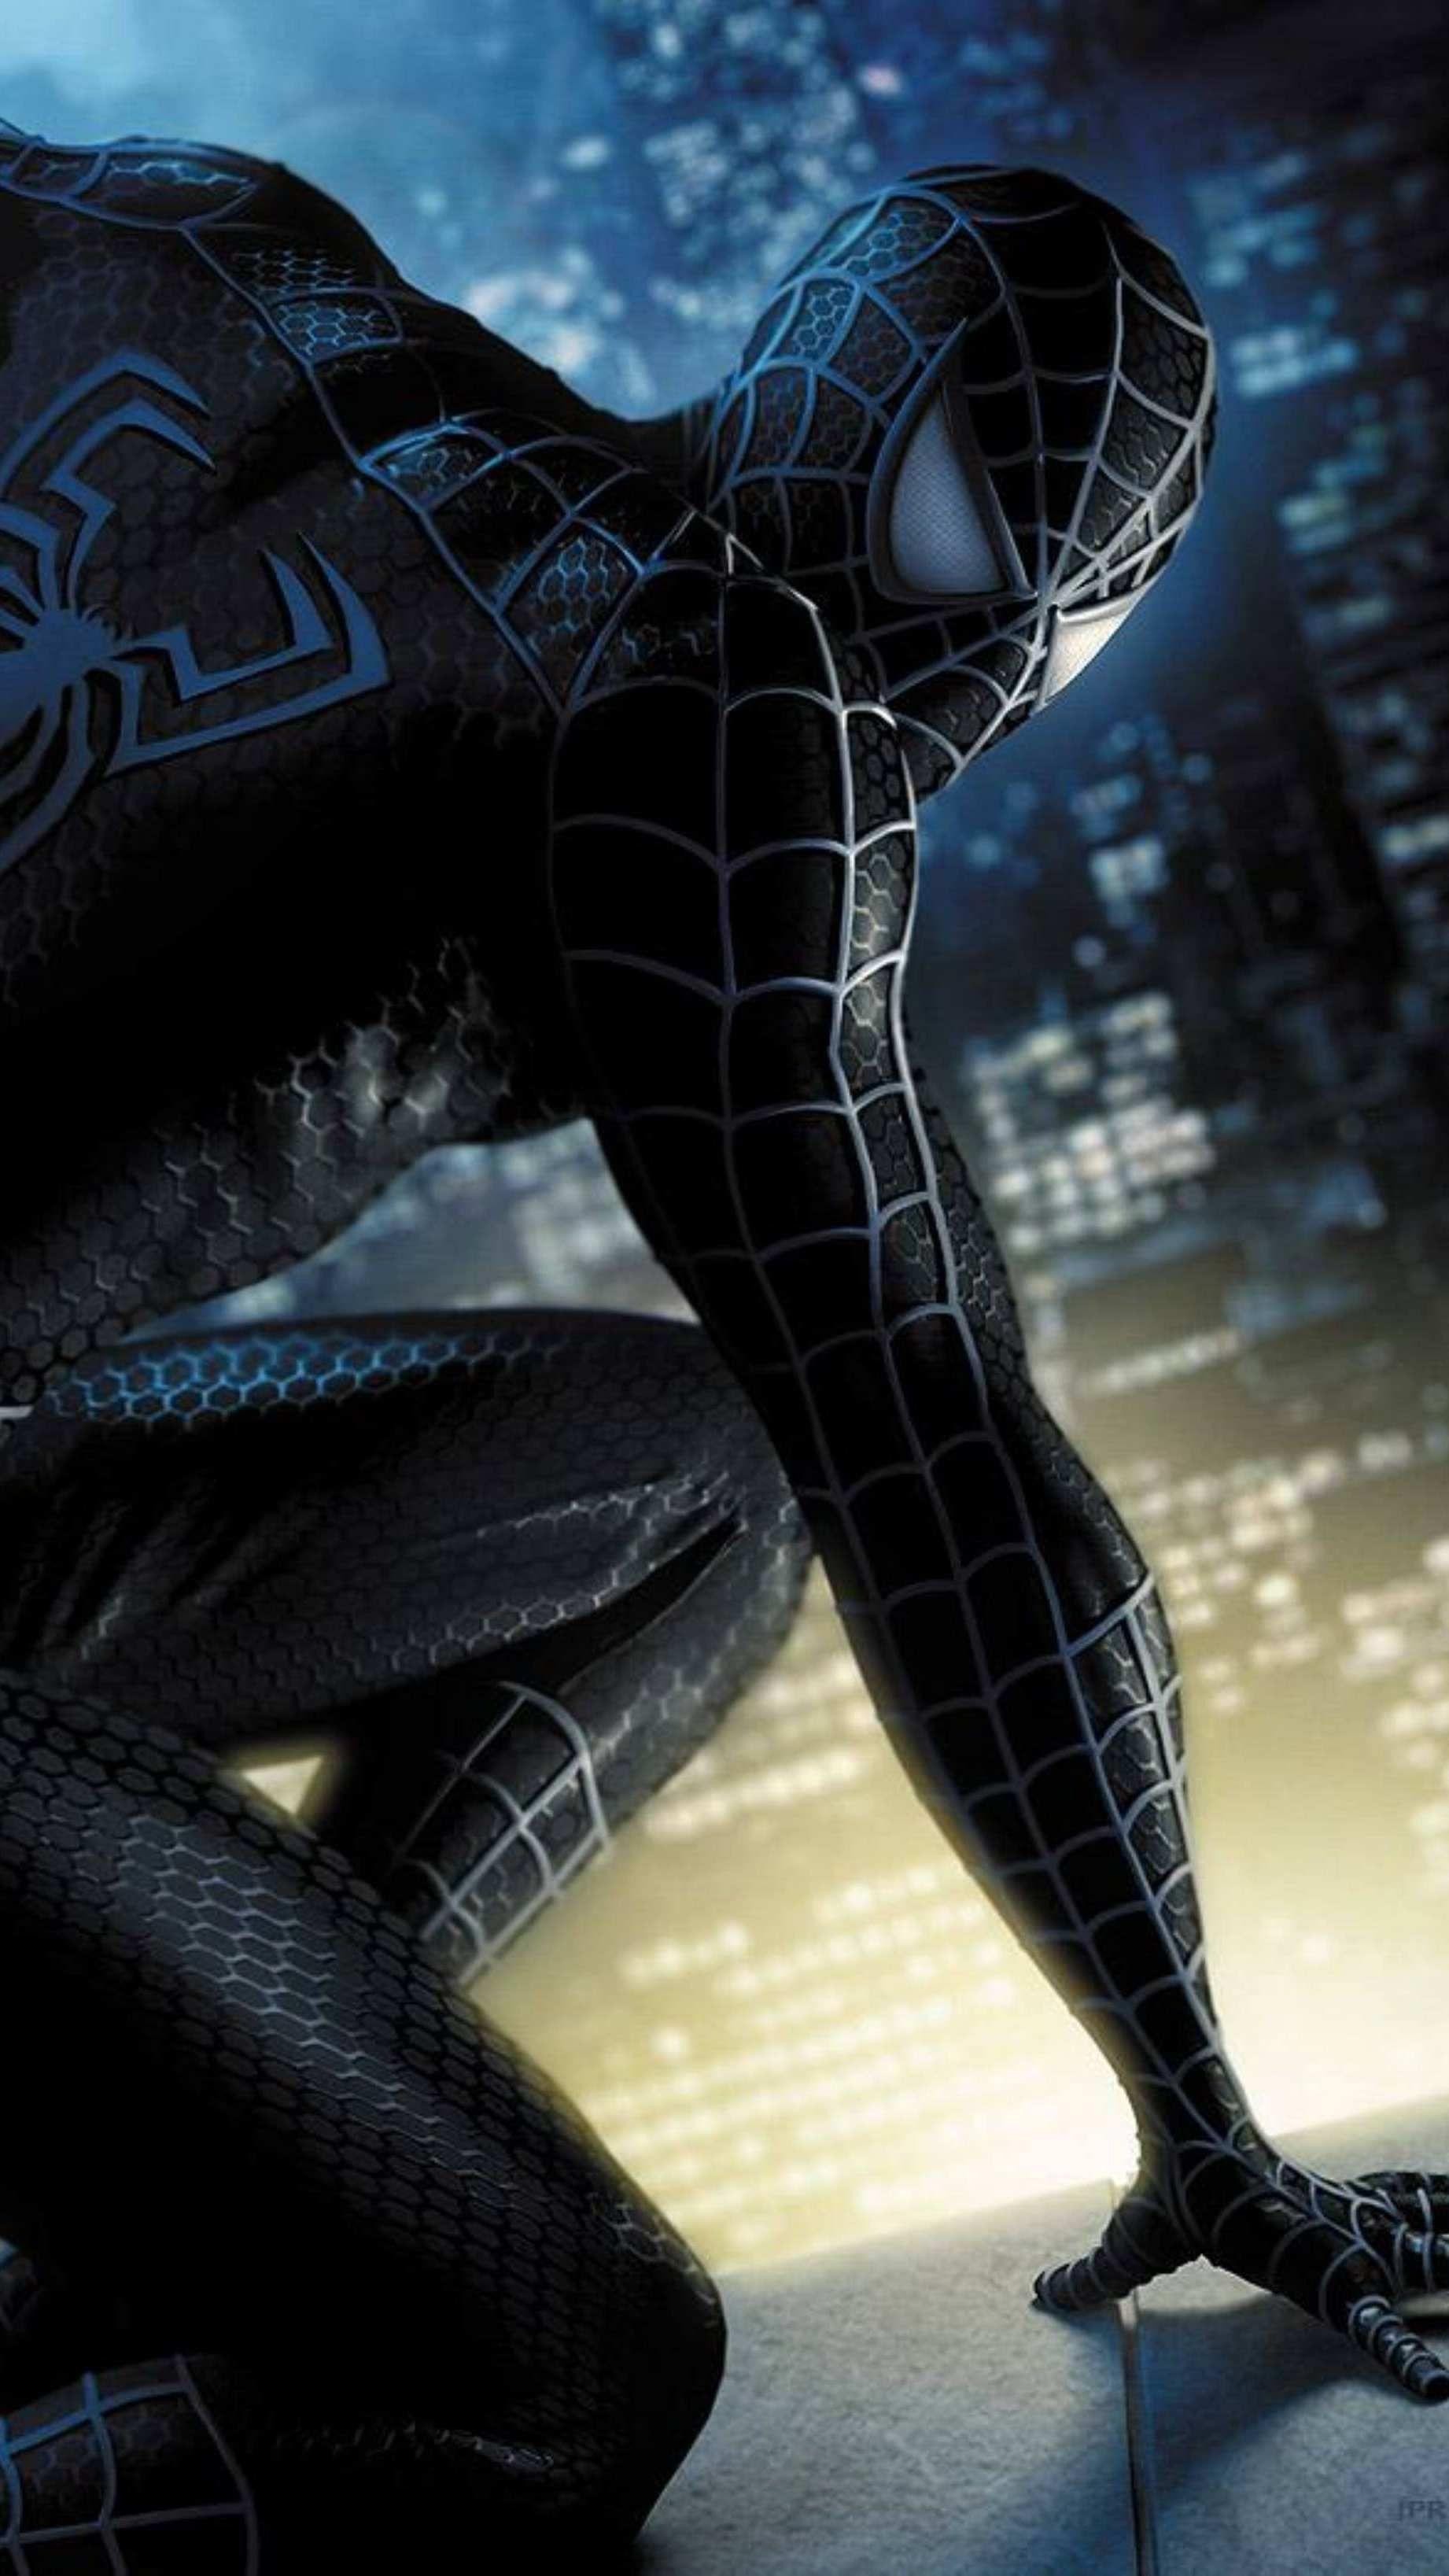 Black Spidey iPhone Wallpaper 1 Black spiderman